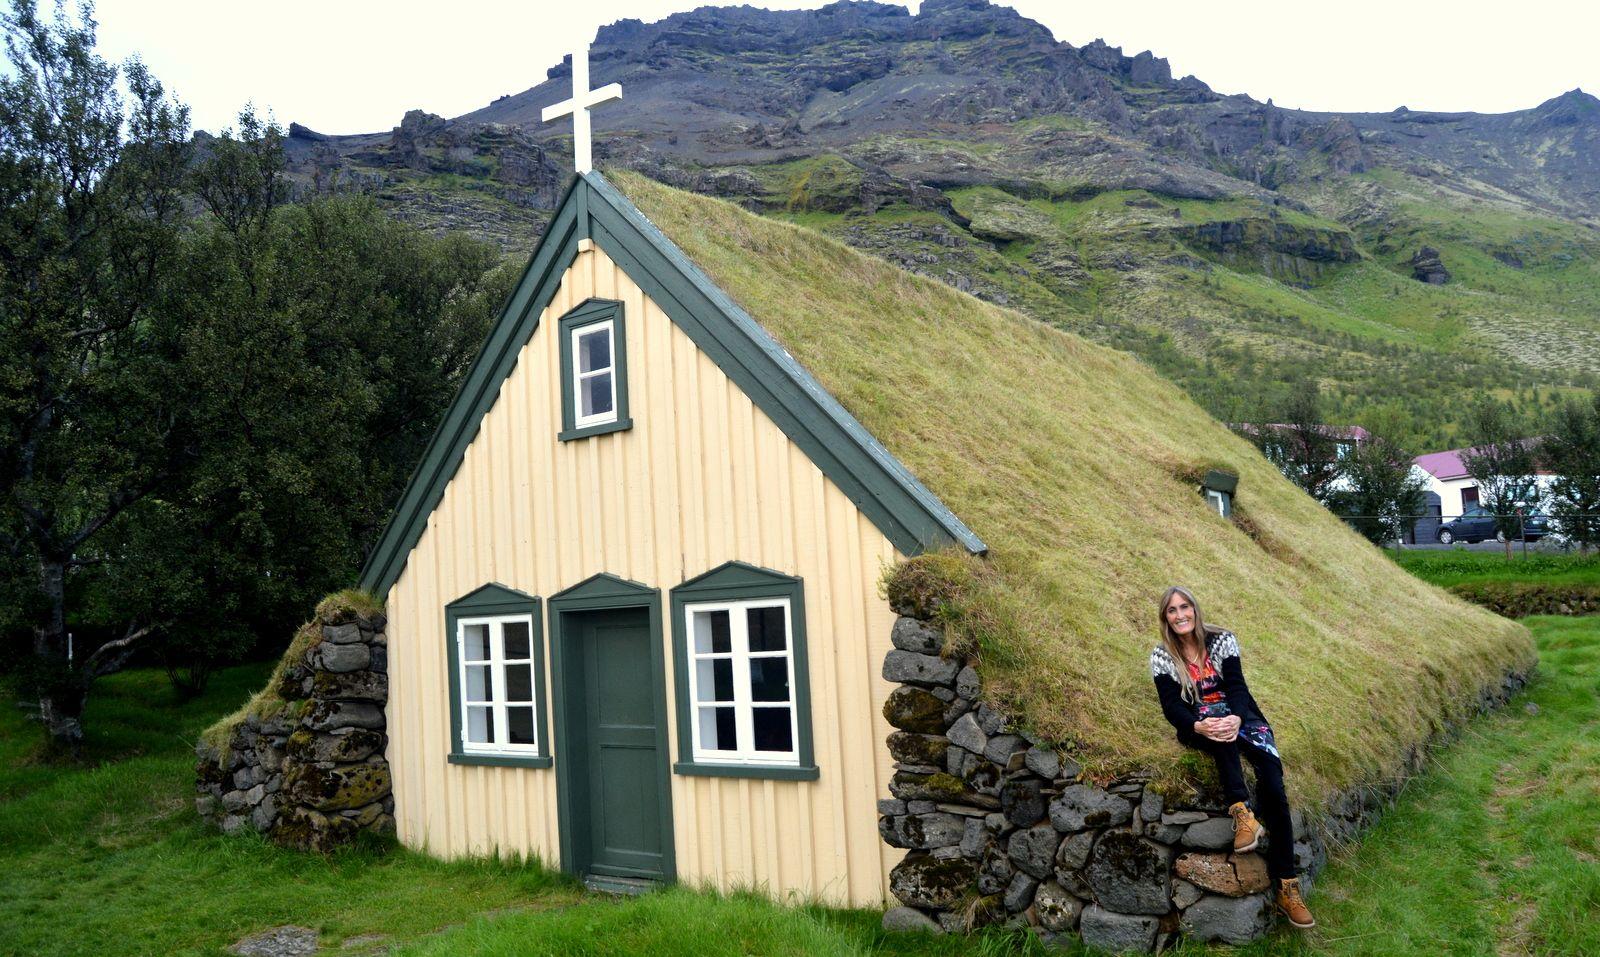 Hofskirkja turf church in Öræfi   Underground homes, Earth ... on iceland homes, icelandic style homes, icelandic turf houses,